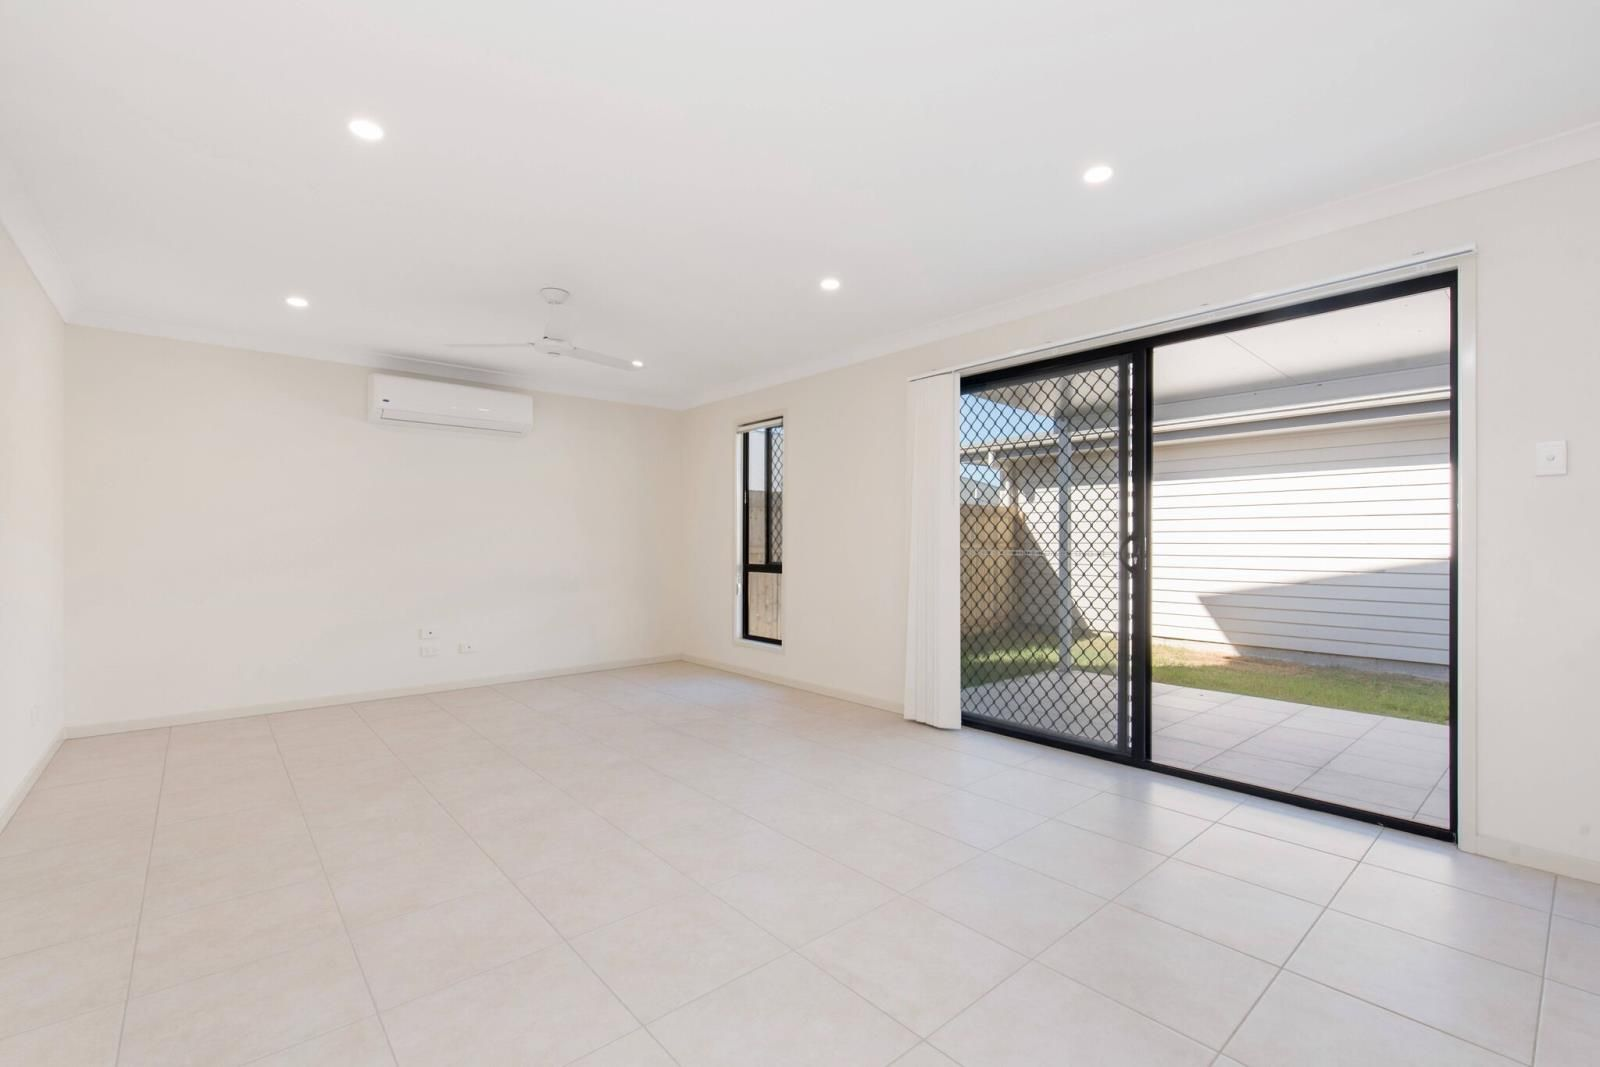 1/26 Dalby Street, Holmview QLD 4207, Image 2